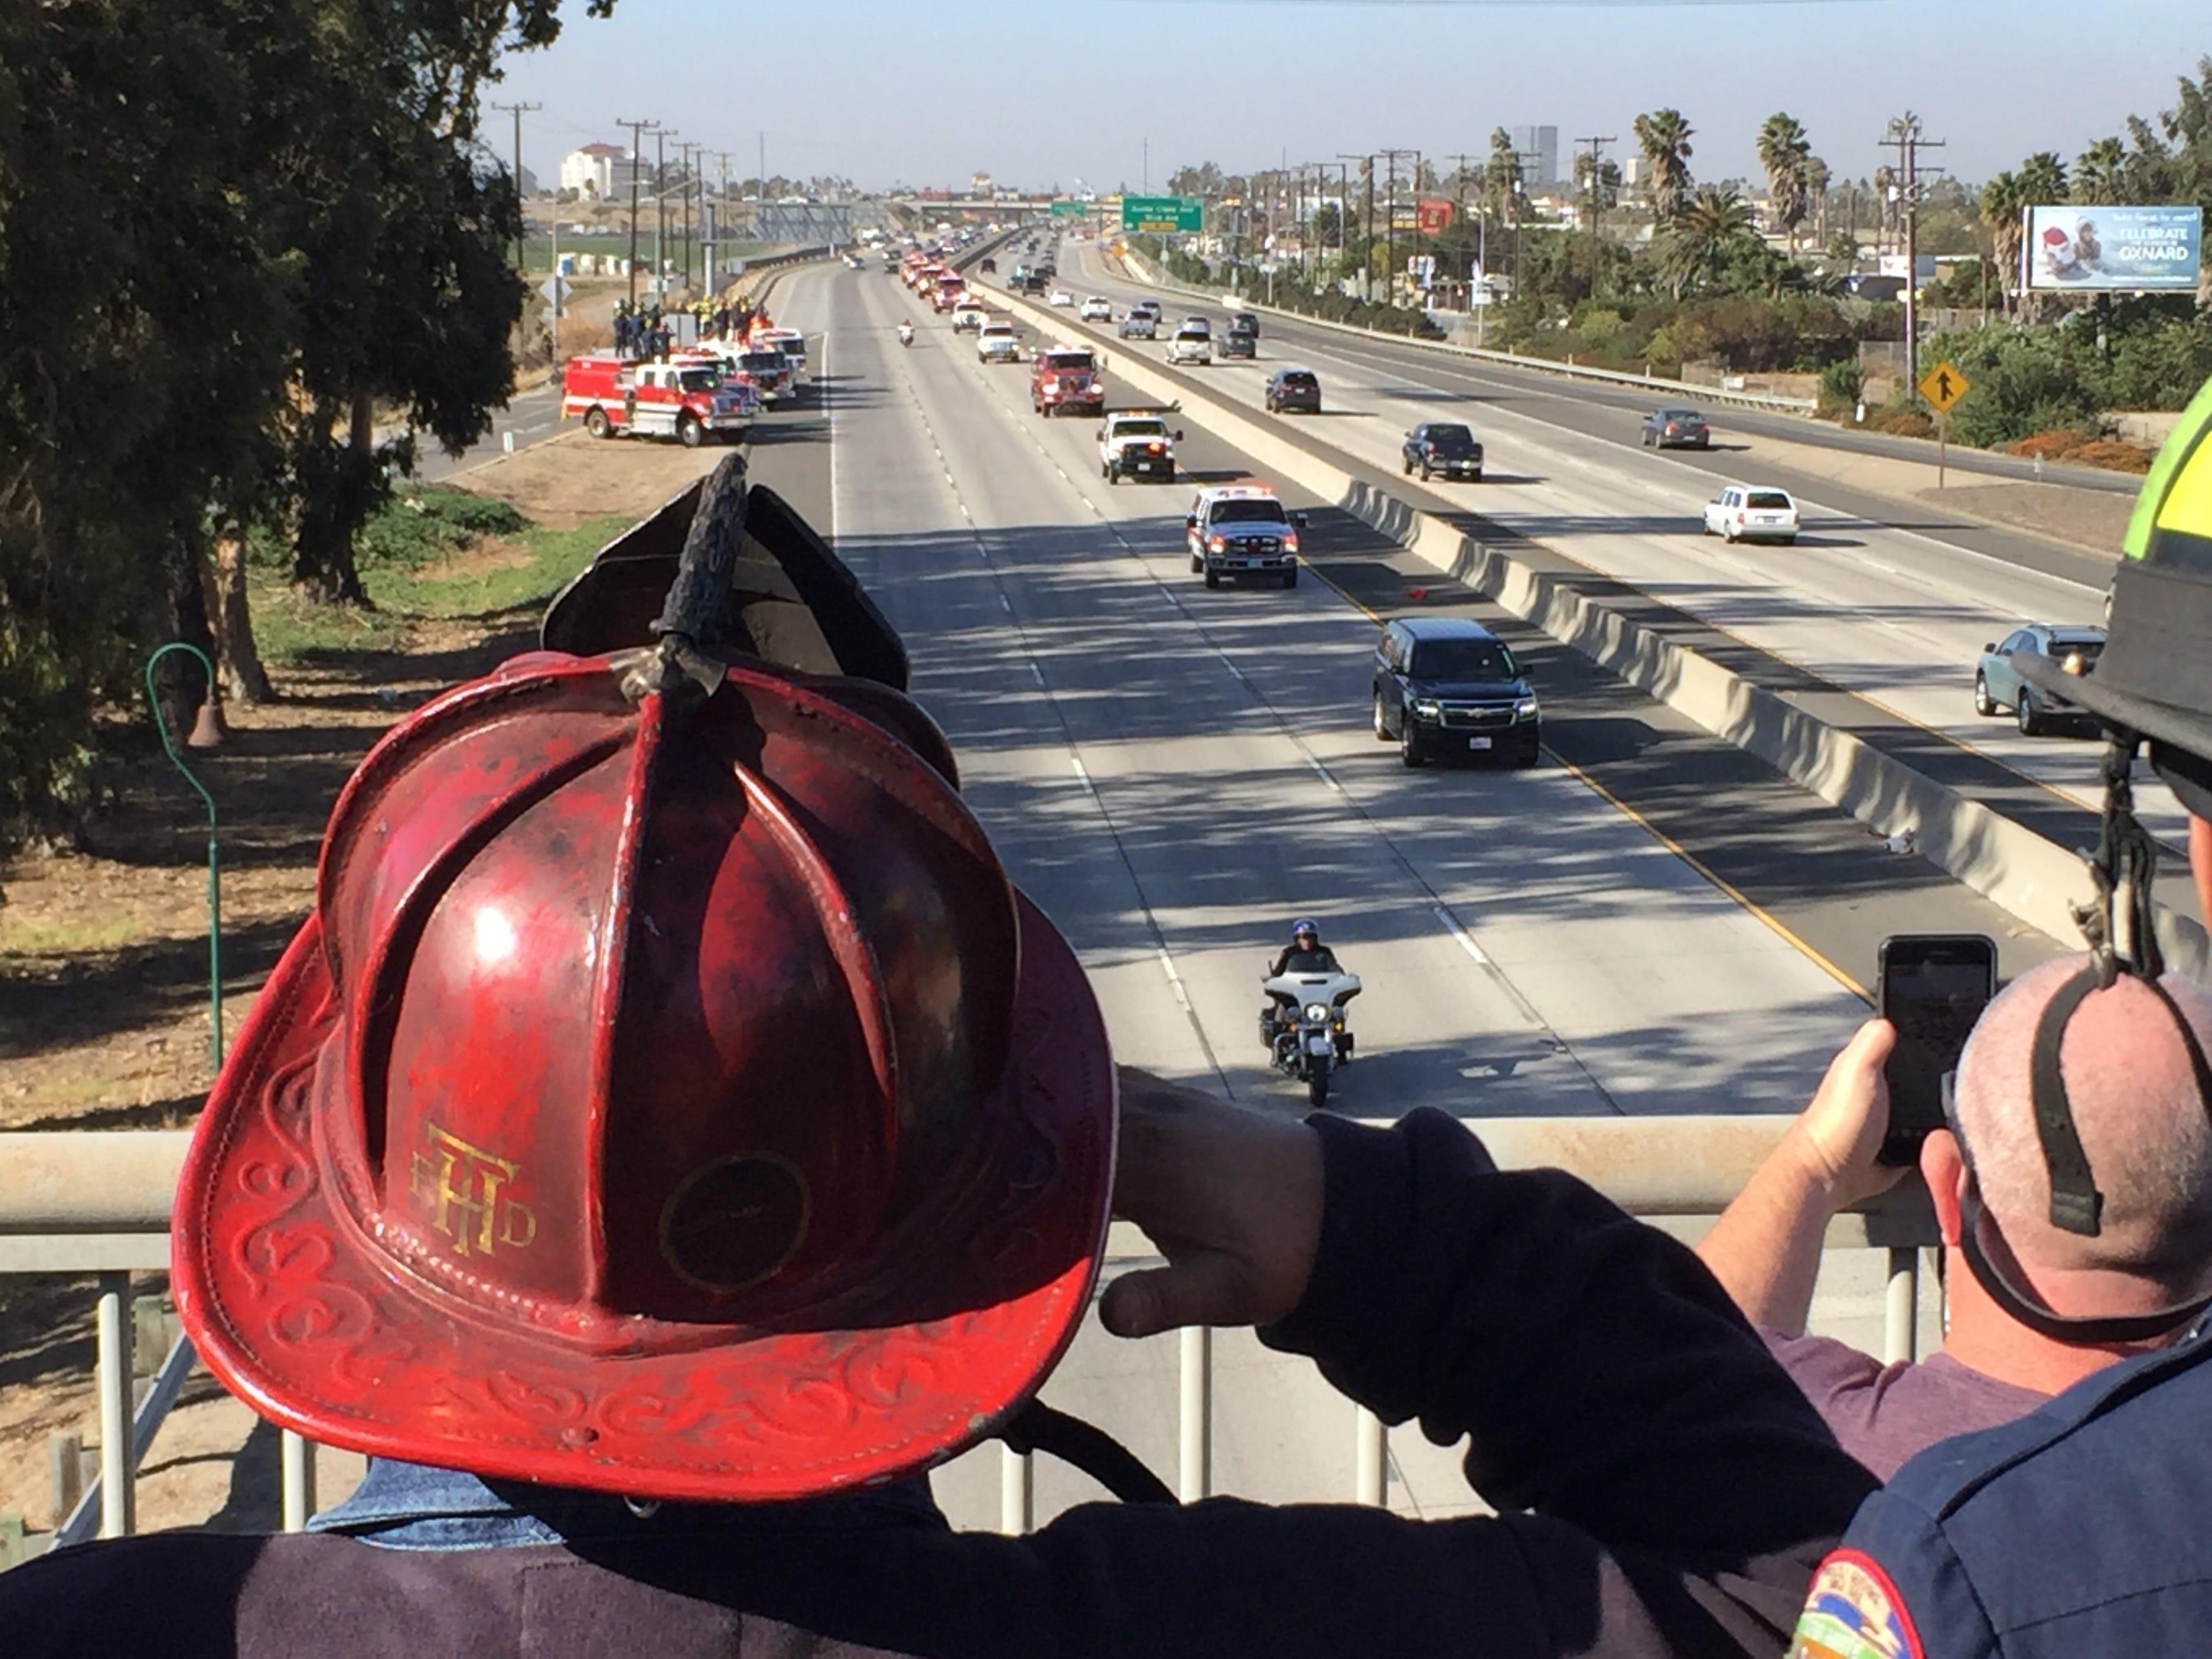 Fireman three ways giant man schlong